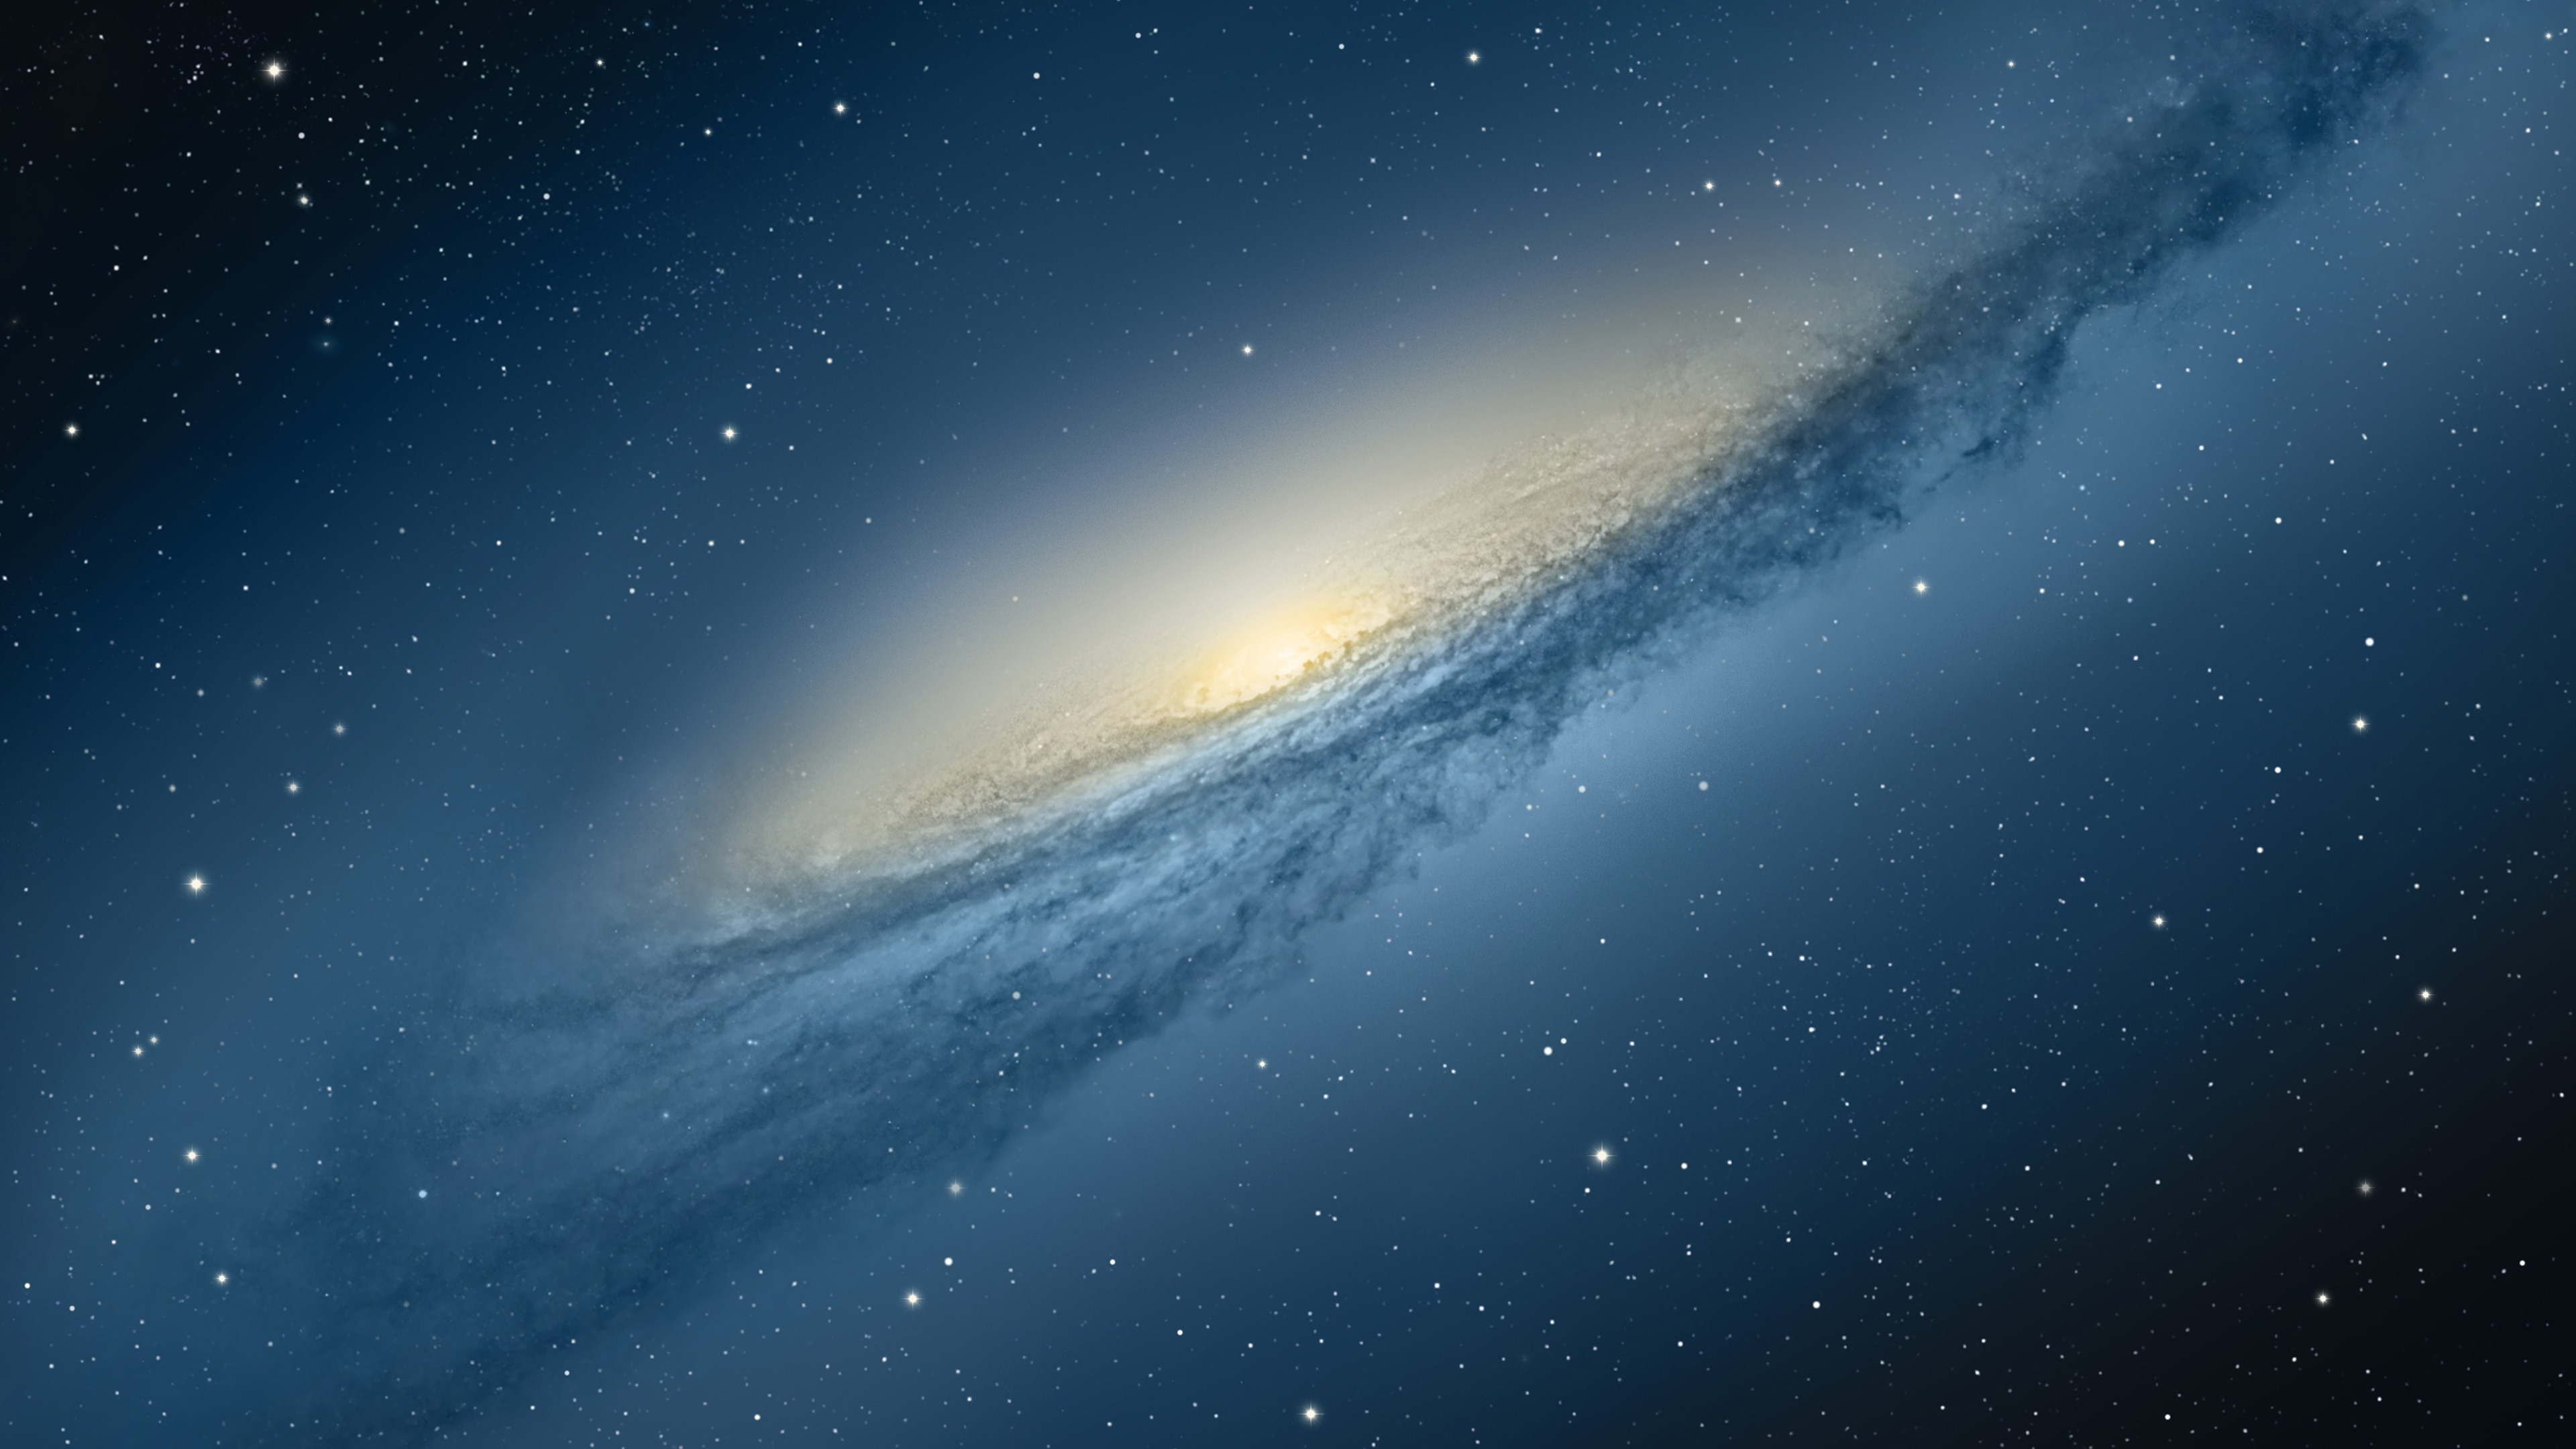 Scientific space planet galaxy stars mac ox ultrahd 4k wallpaper wallpaper  | | 196208 | WallpaperUP